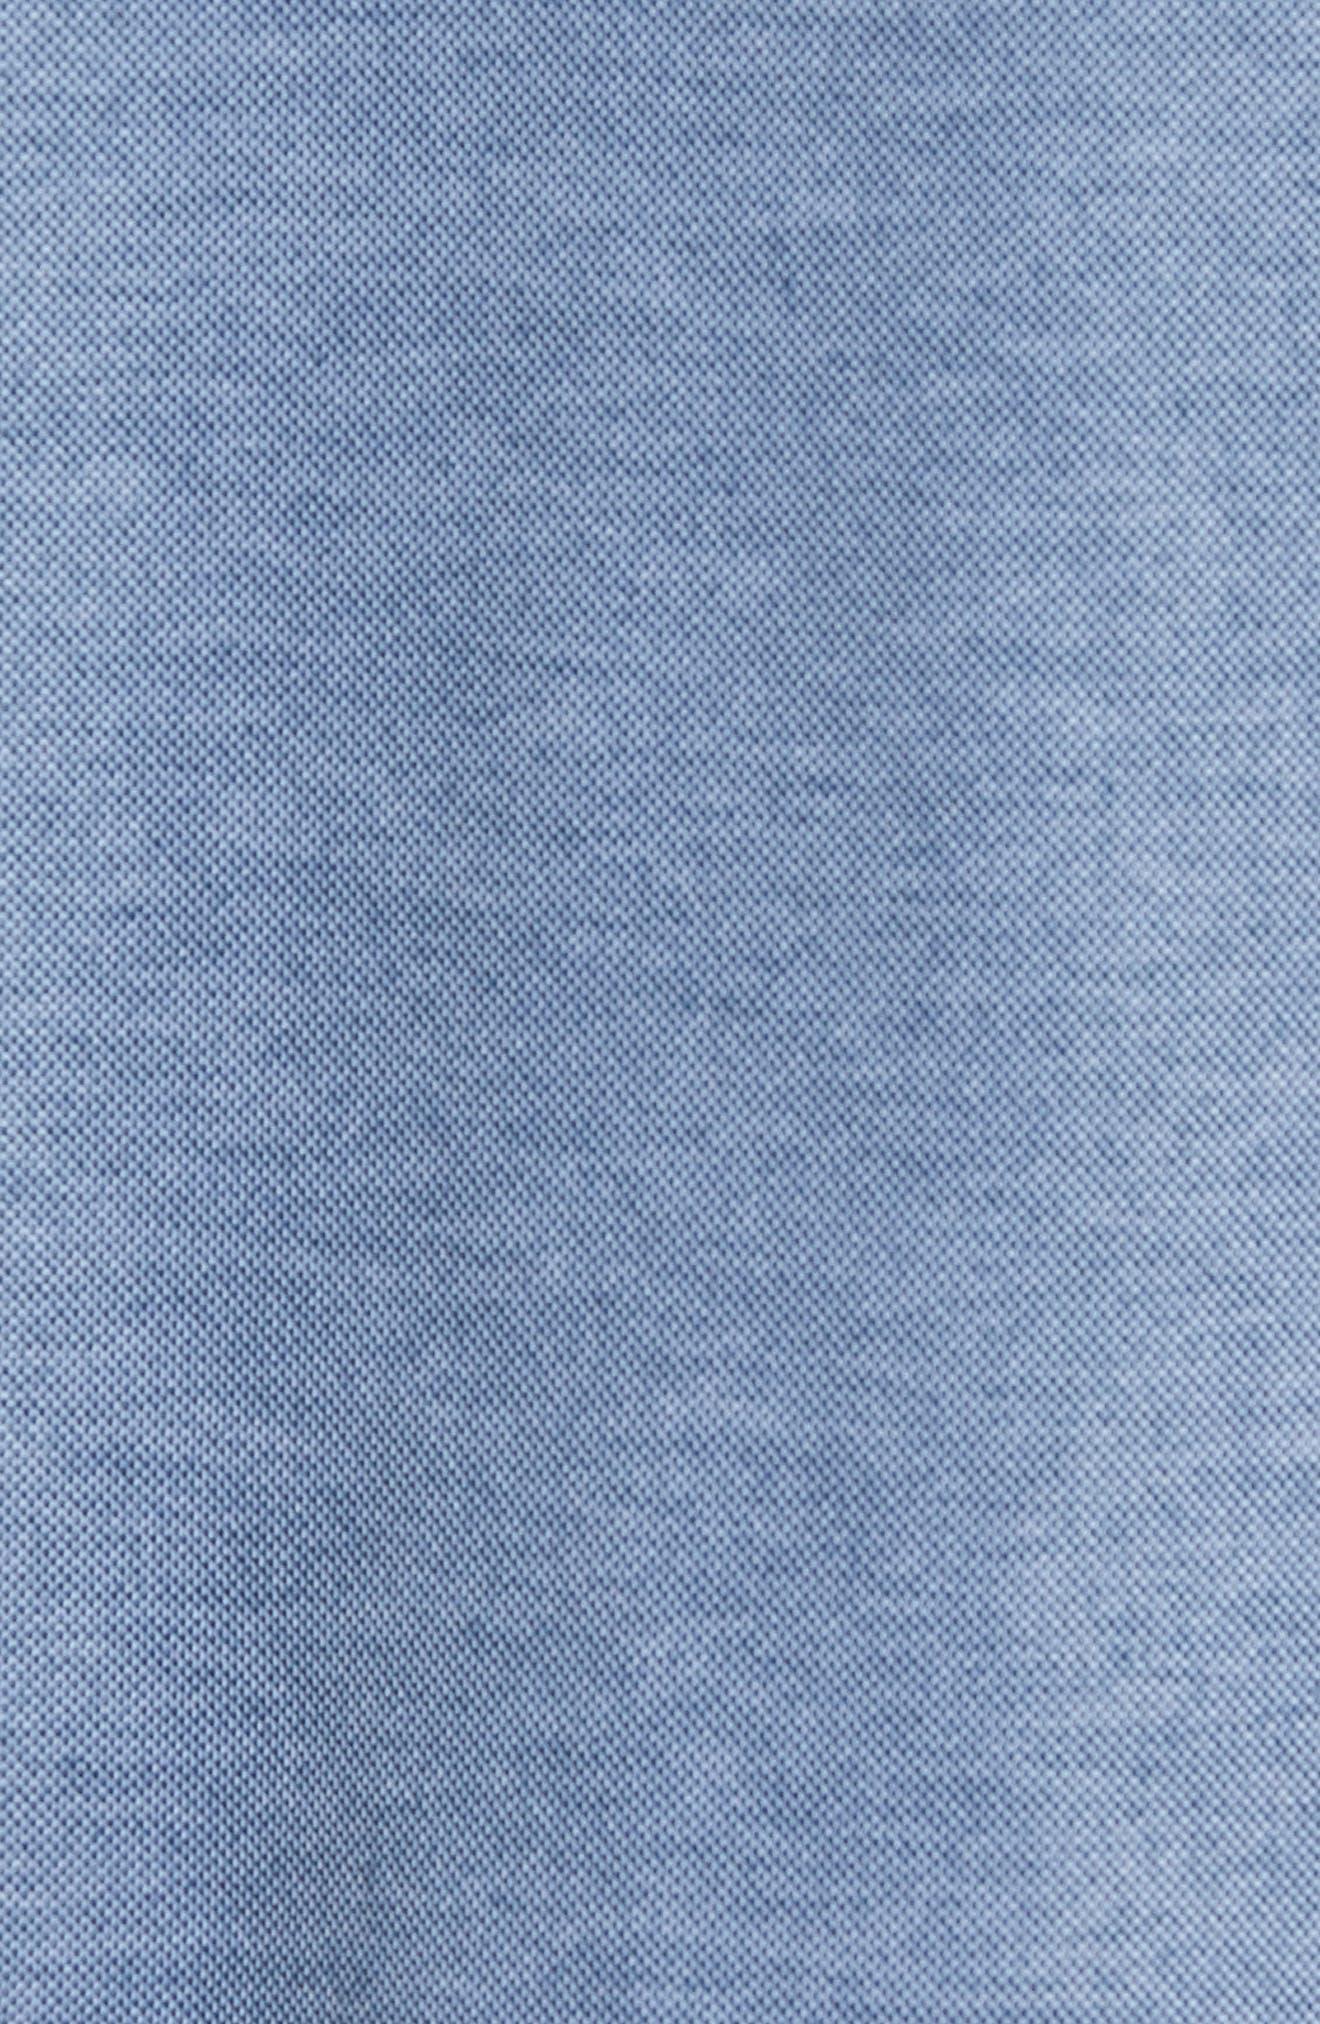 Racket Piqué Polo,                             Alternate thumbnail 5, color,                             HEATHER BLUE WING TEAL